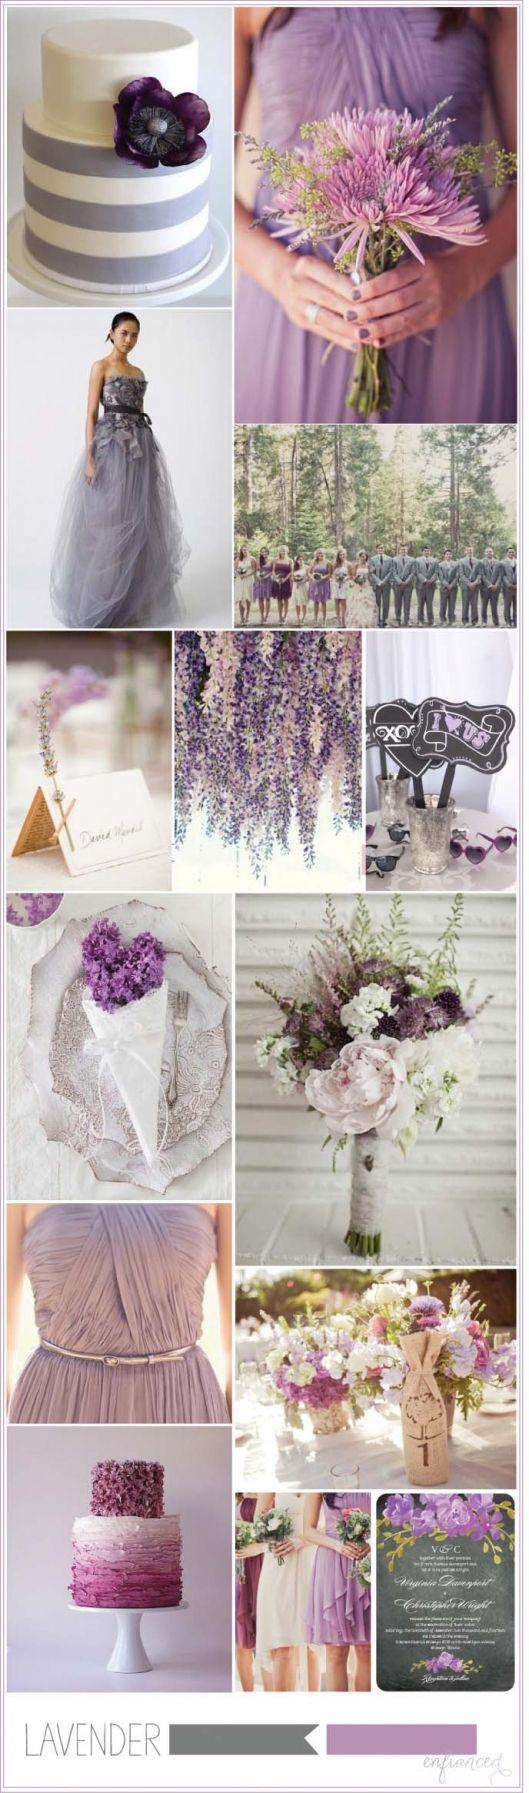 ♡ Lavender Wedding